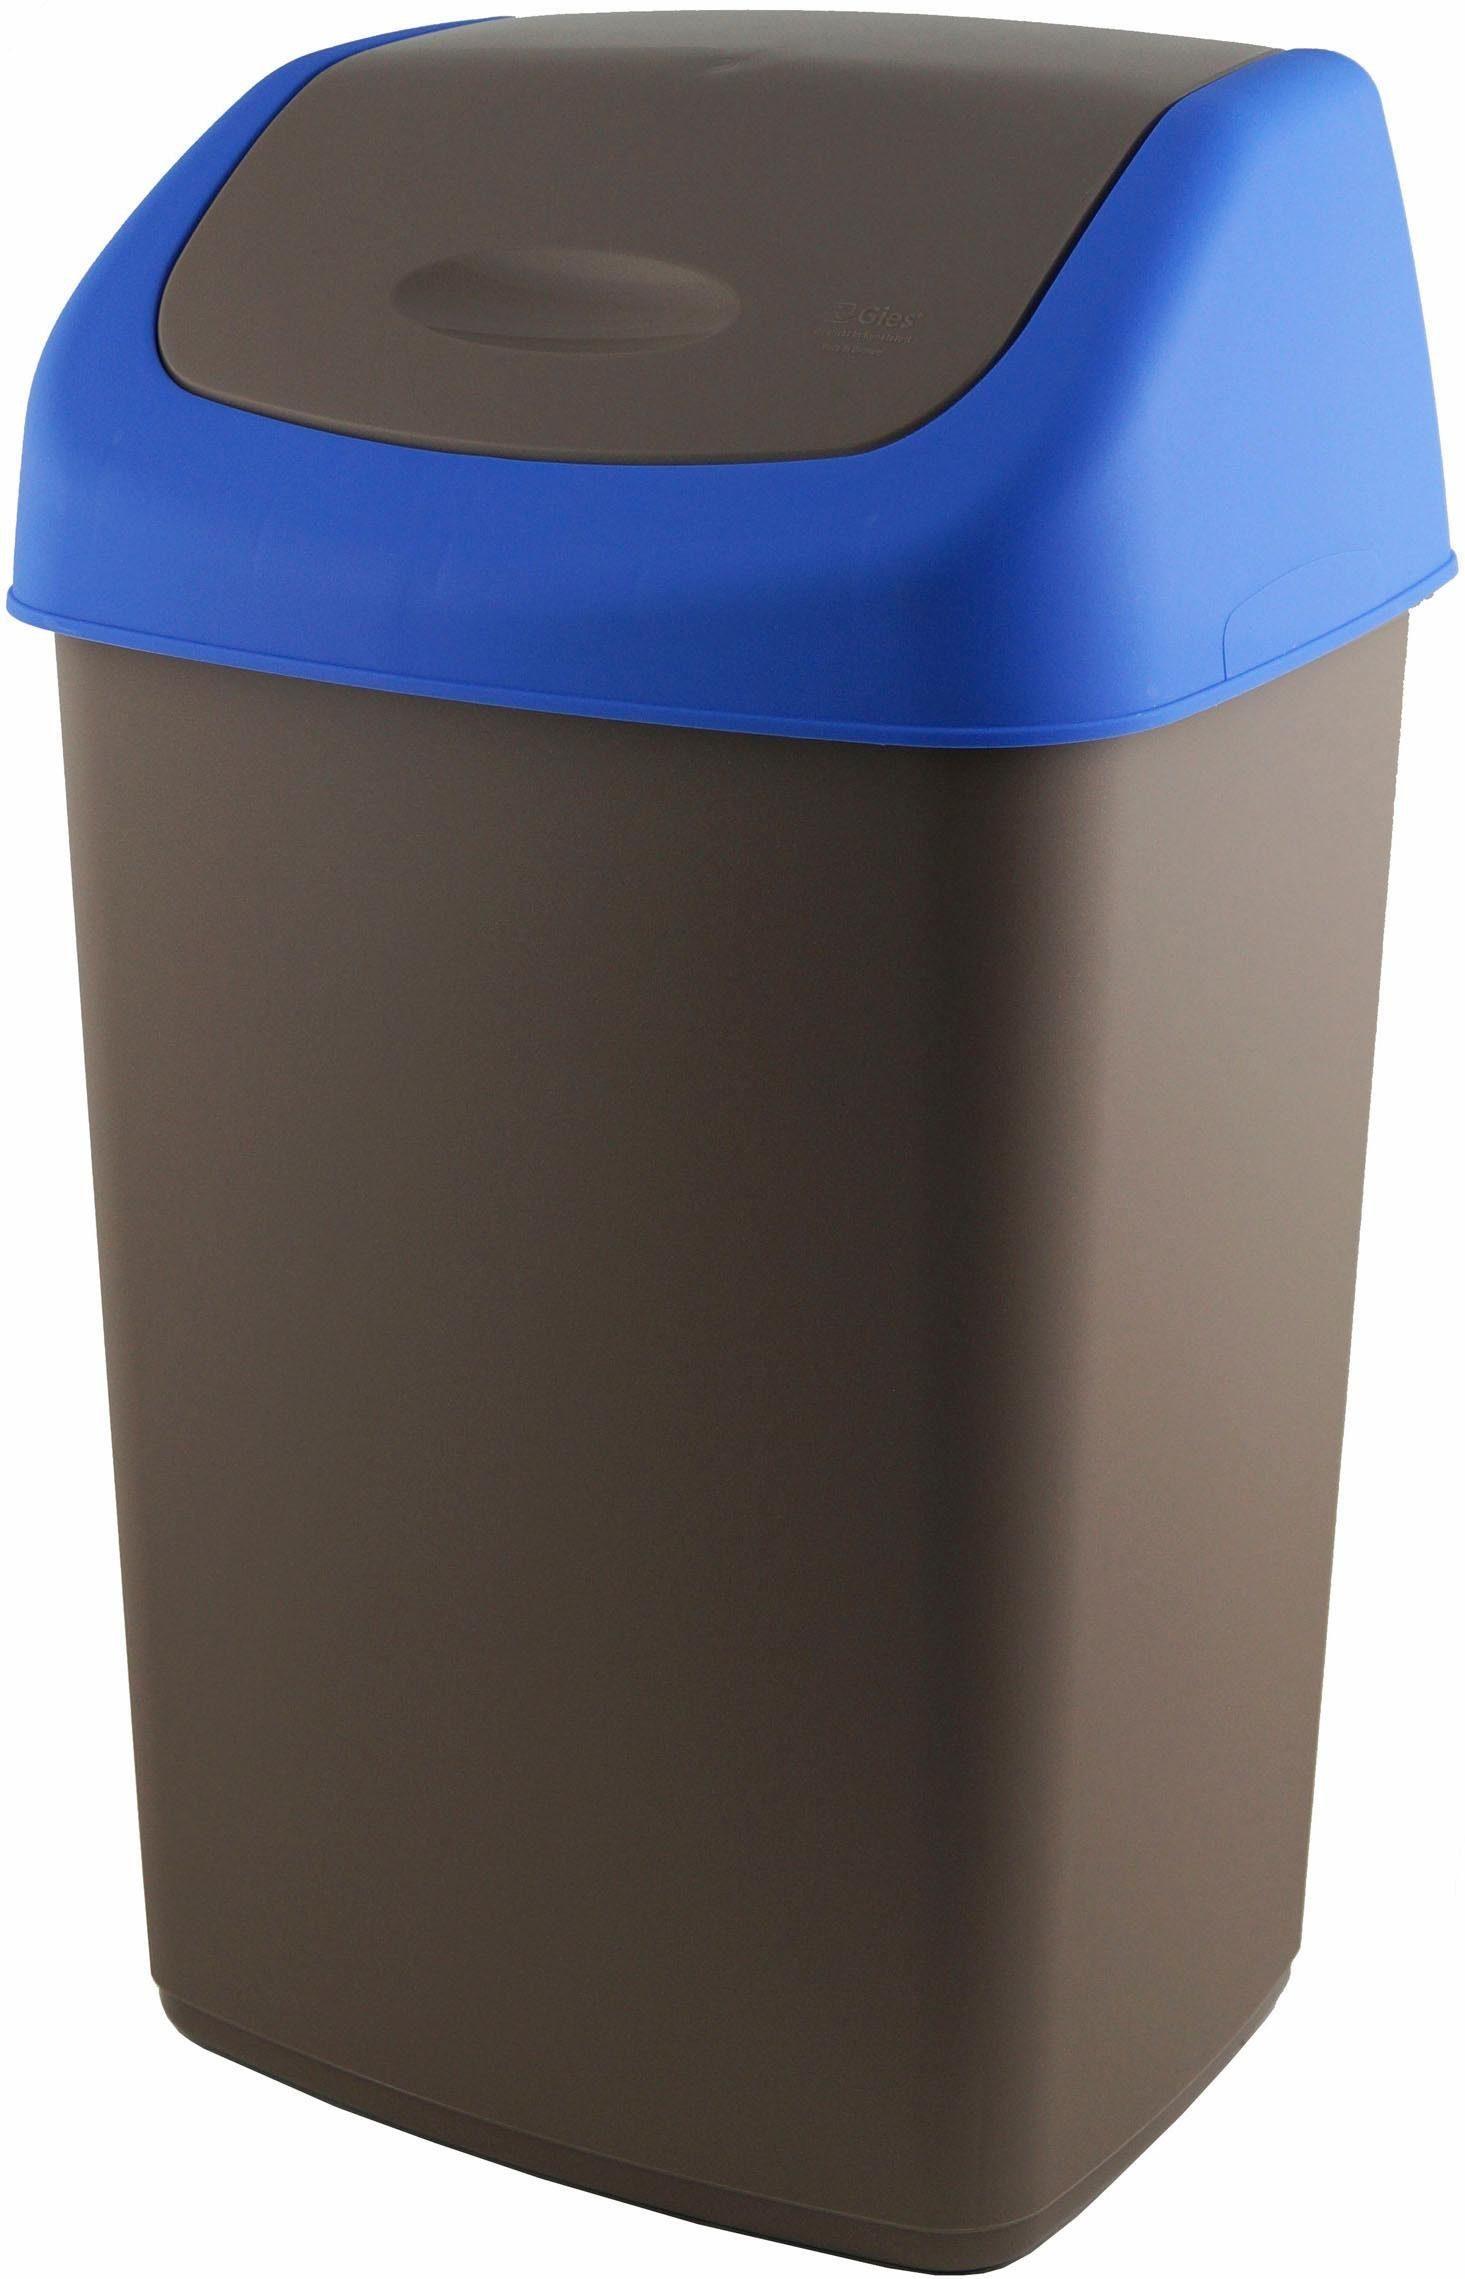 GIES Abfallbehälter, 24 Liter, »PUSH«